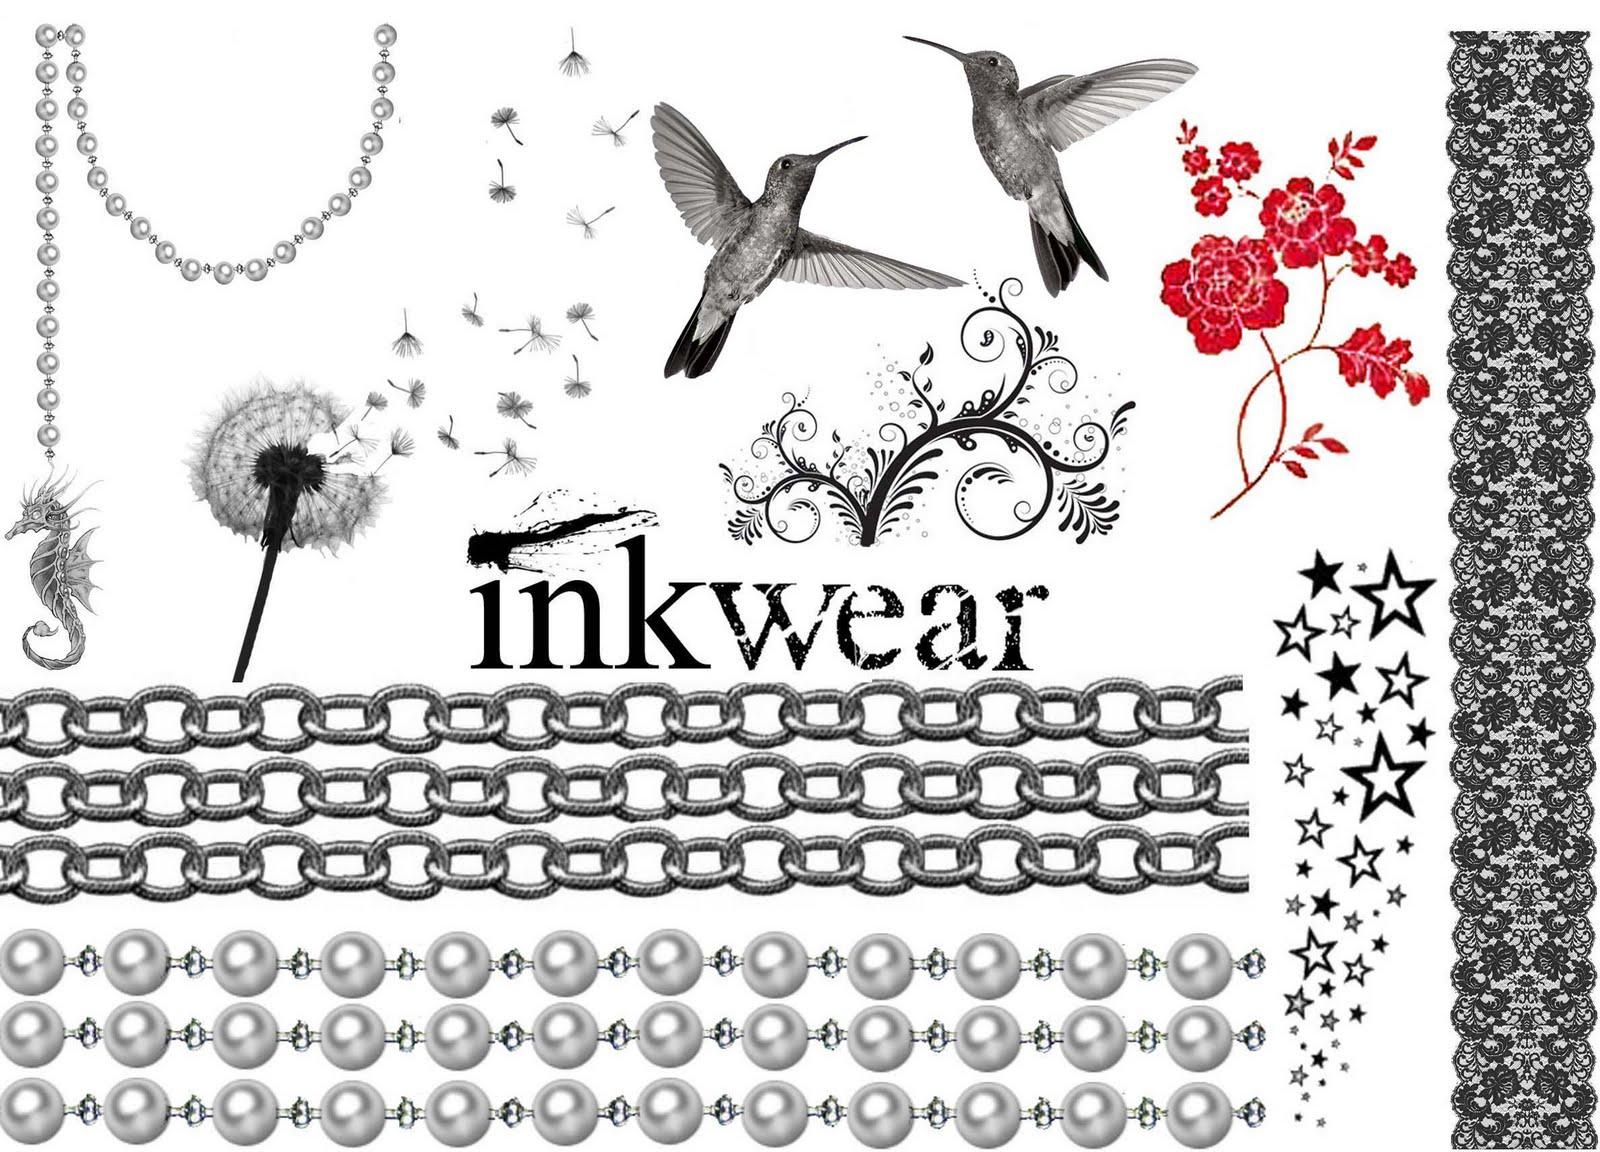 http://2.bp.blogspot.com/_te8RcUag03I/S8ilJHtr_5I/AAAAAAAAC4I/cn8n9ByFKpU/s1600/Stars,%2Bbirds%2Band%2Bjewels%2Btattoo%2Bset%2B%40%2Binkwear.co.uk.jpg